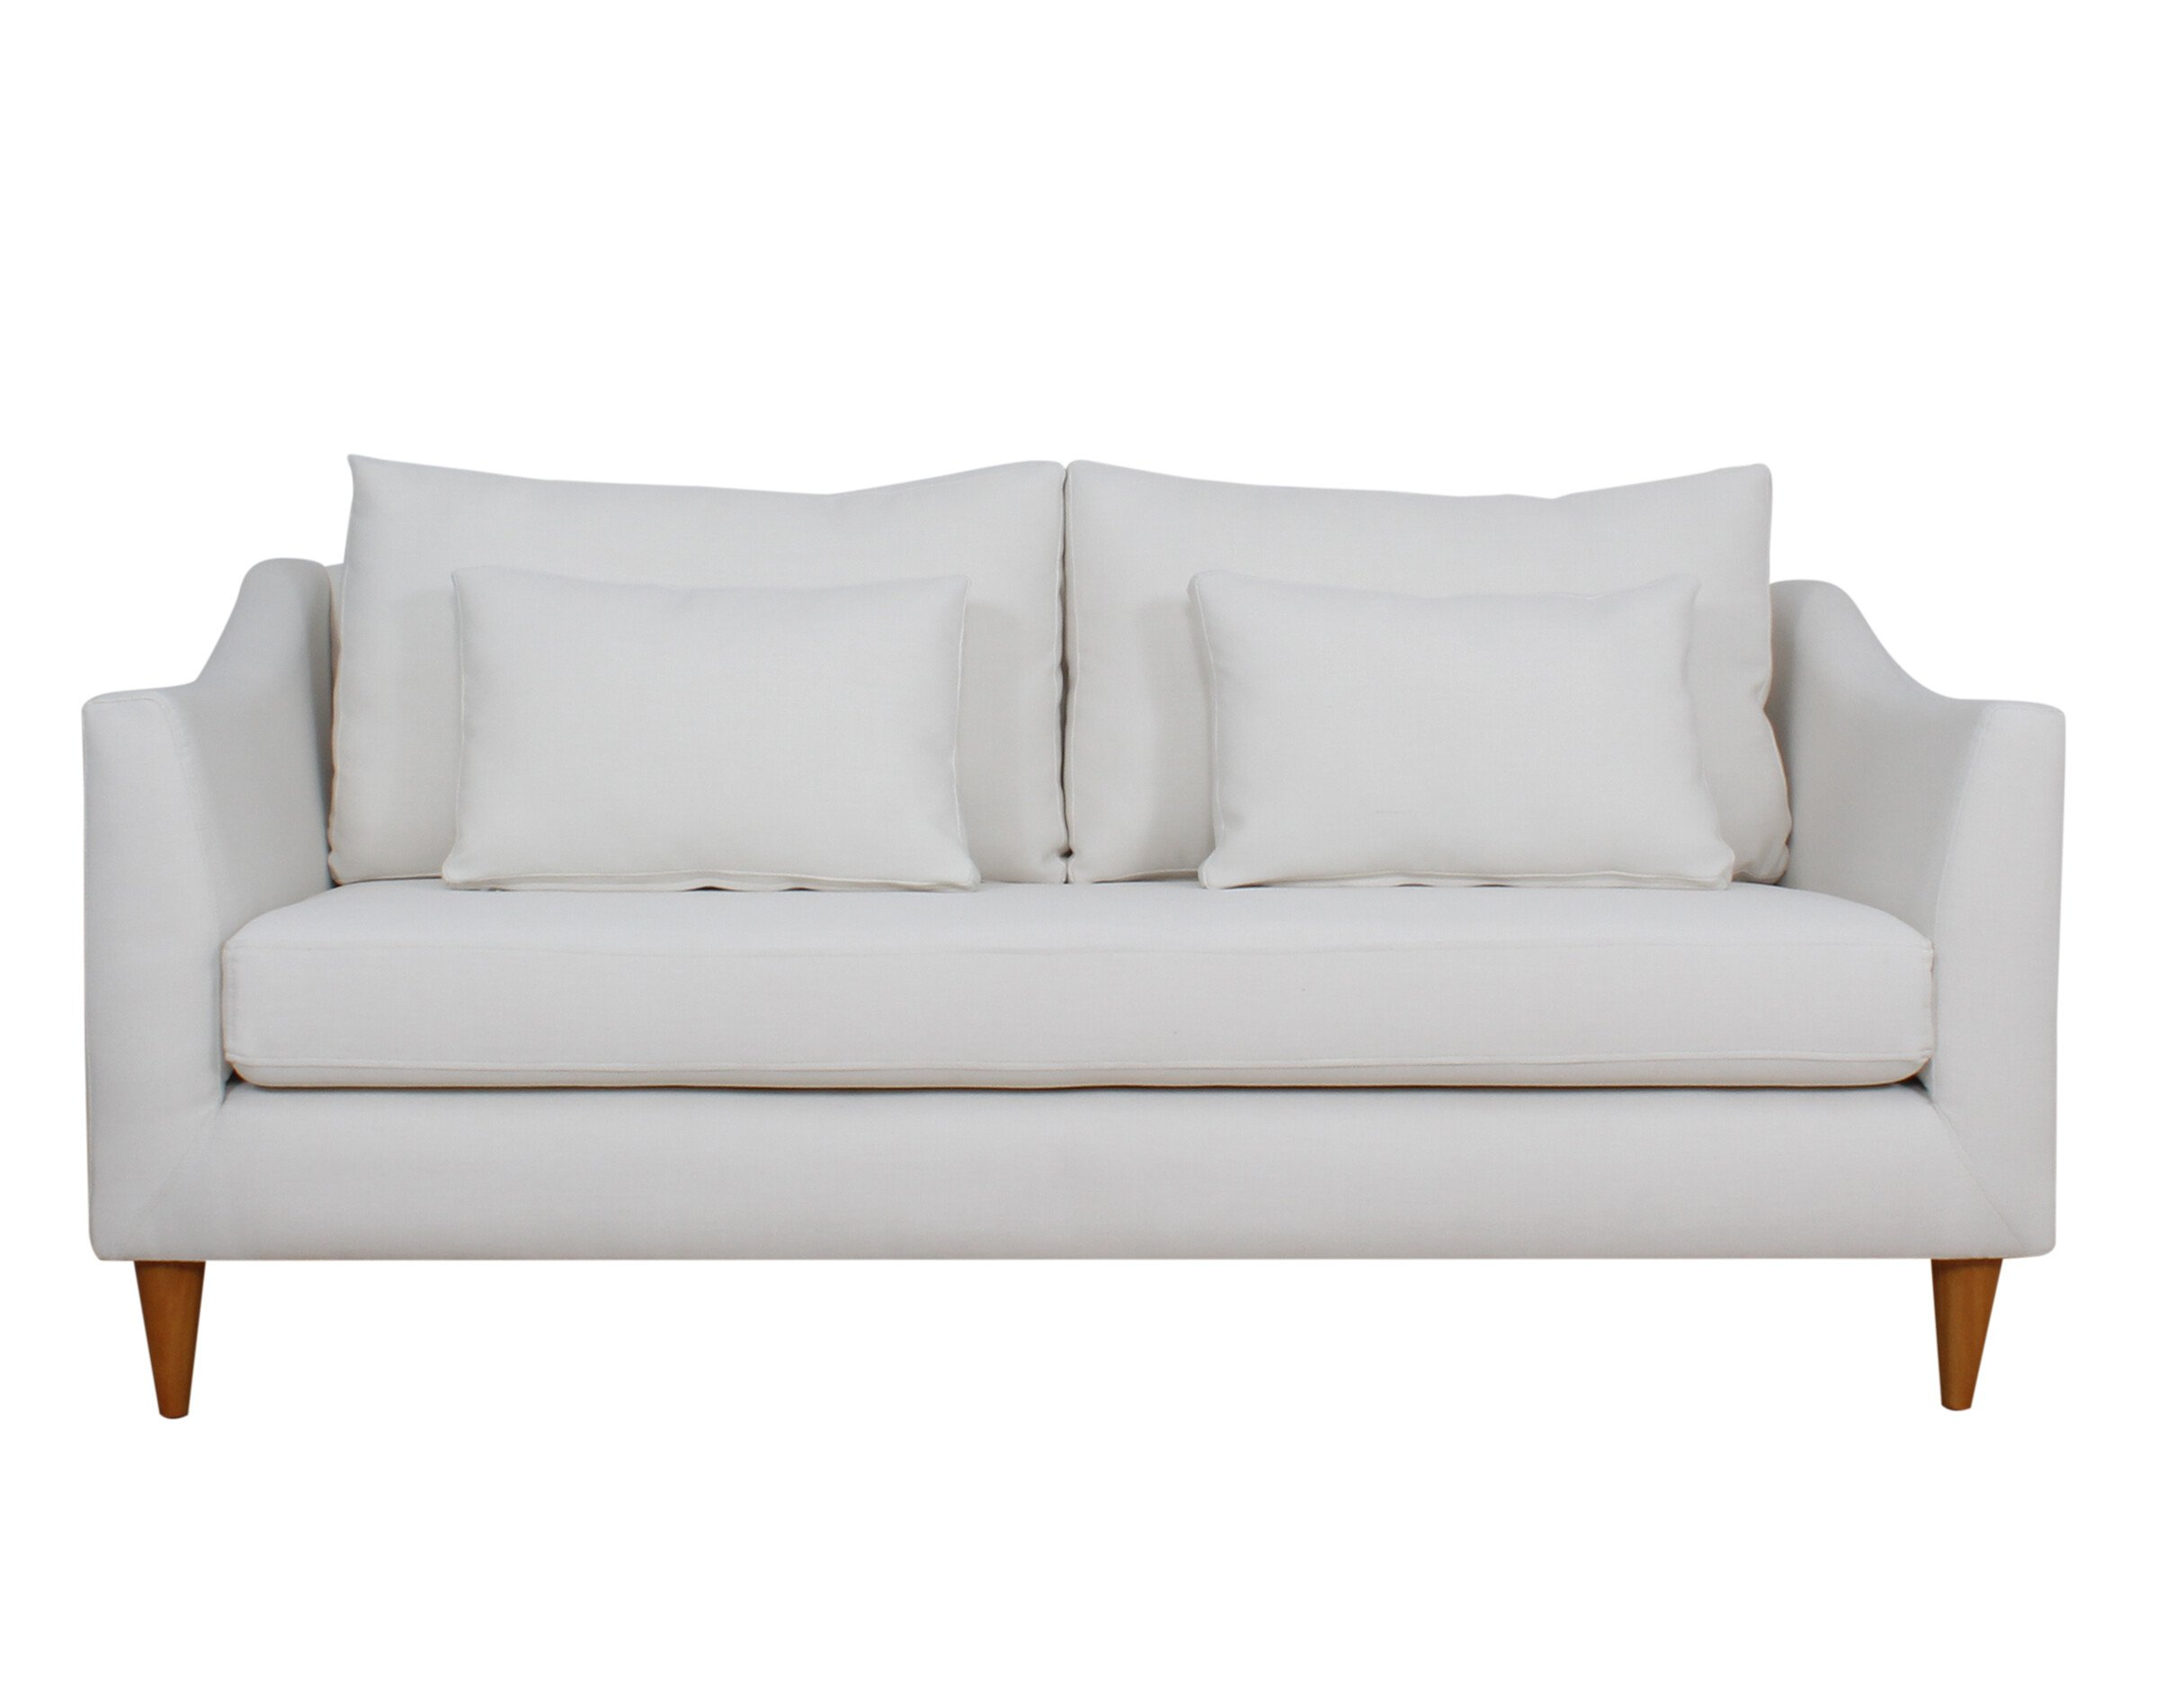 Sofa 2 Cuerpos Brazo Curva